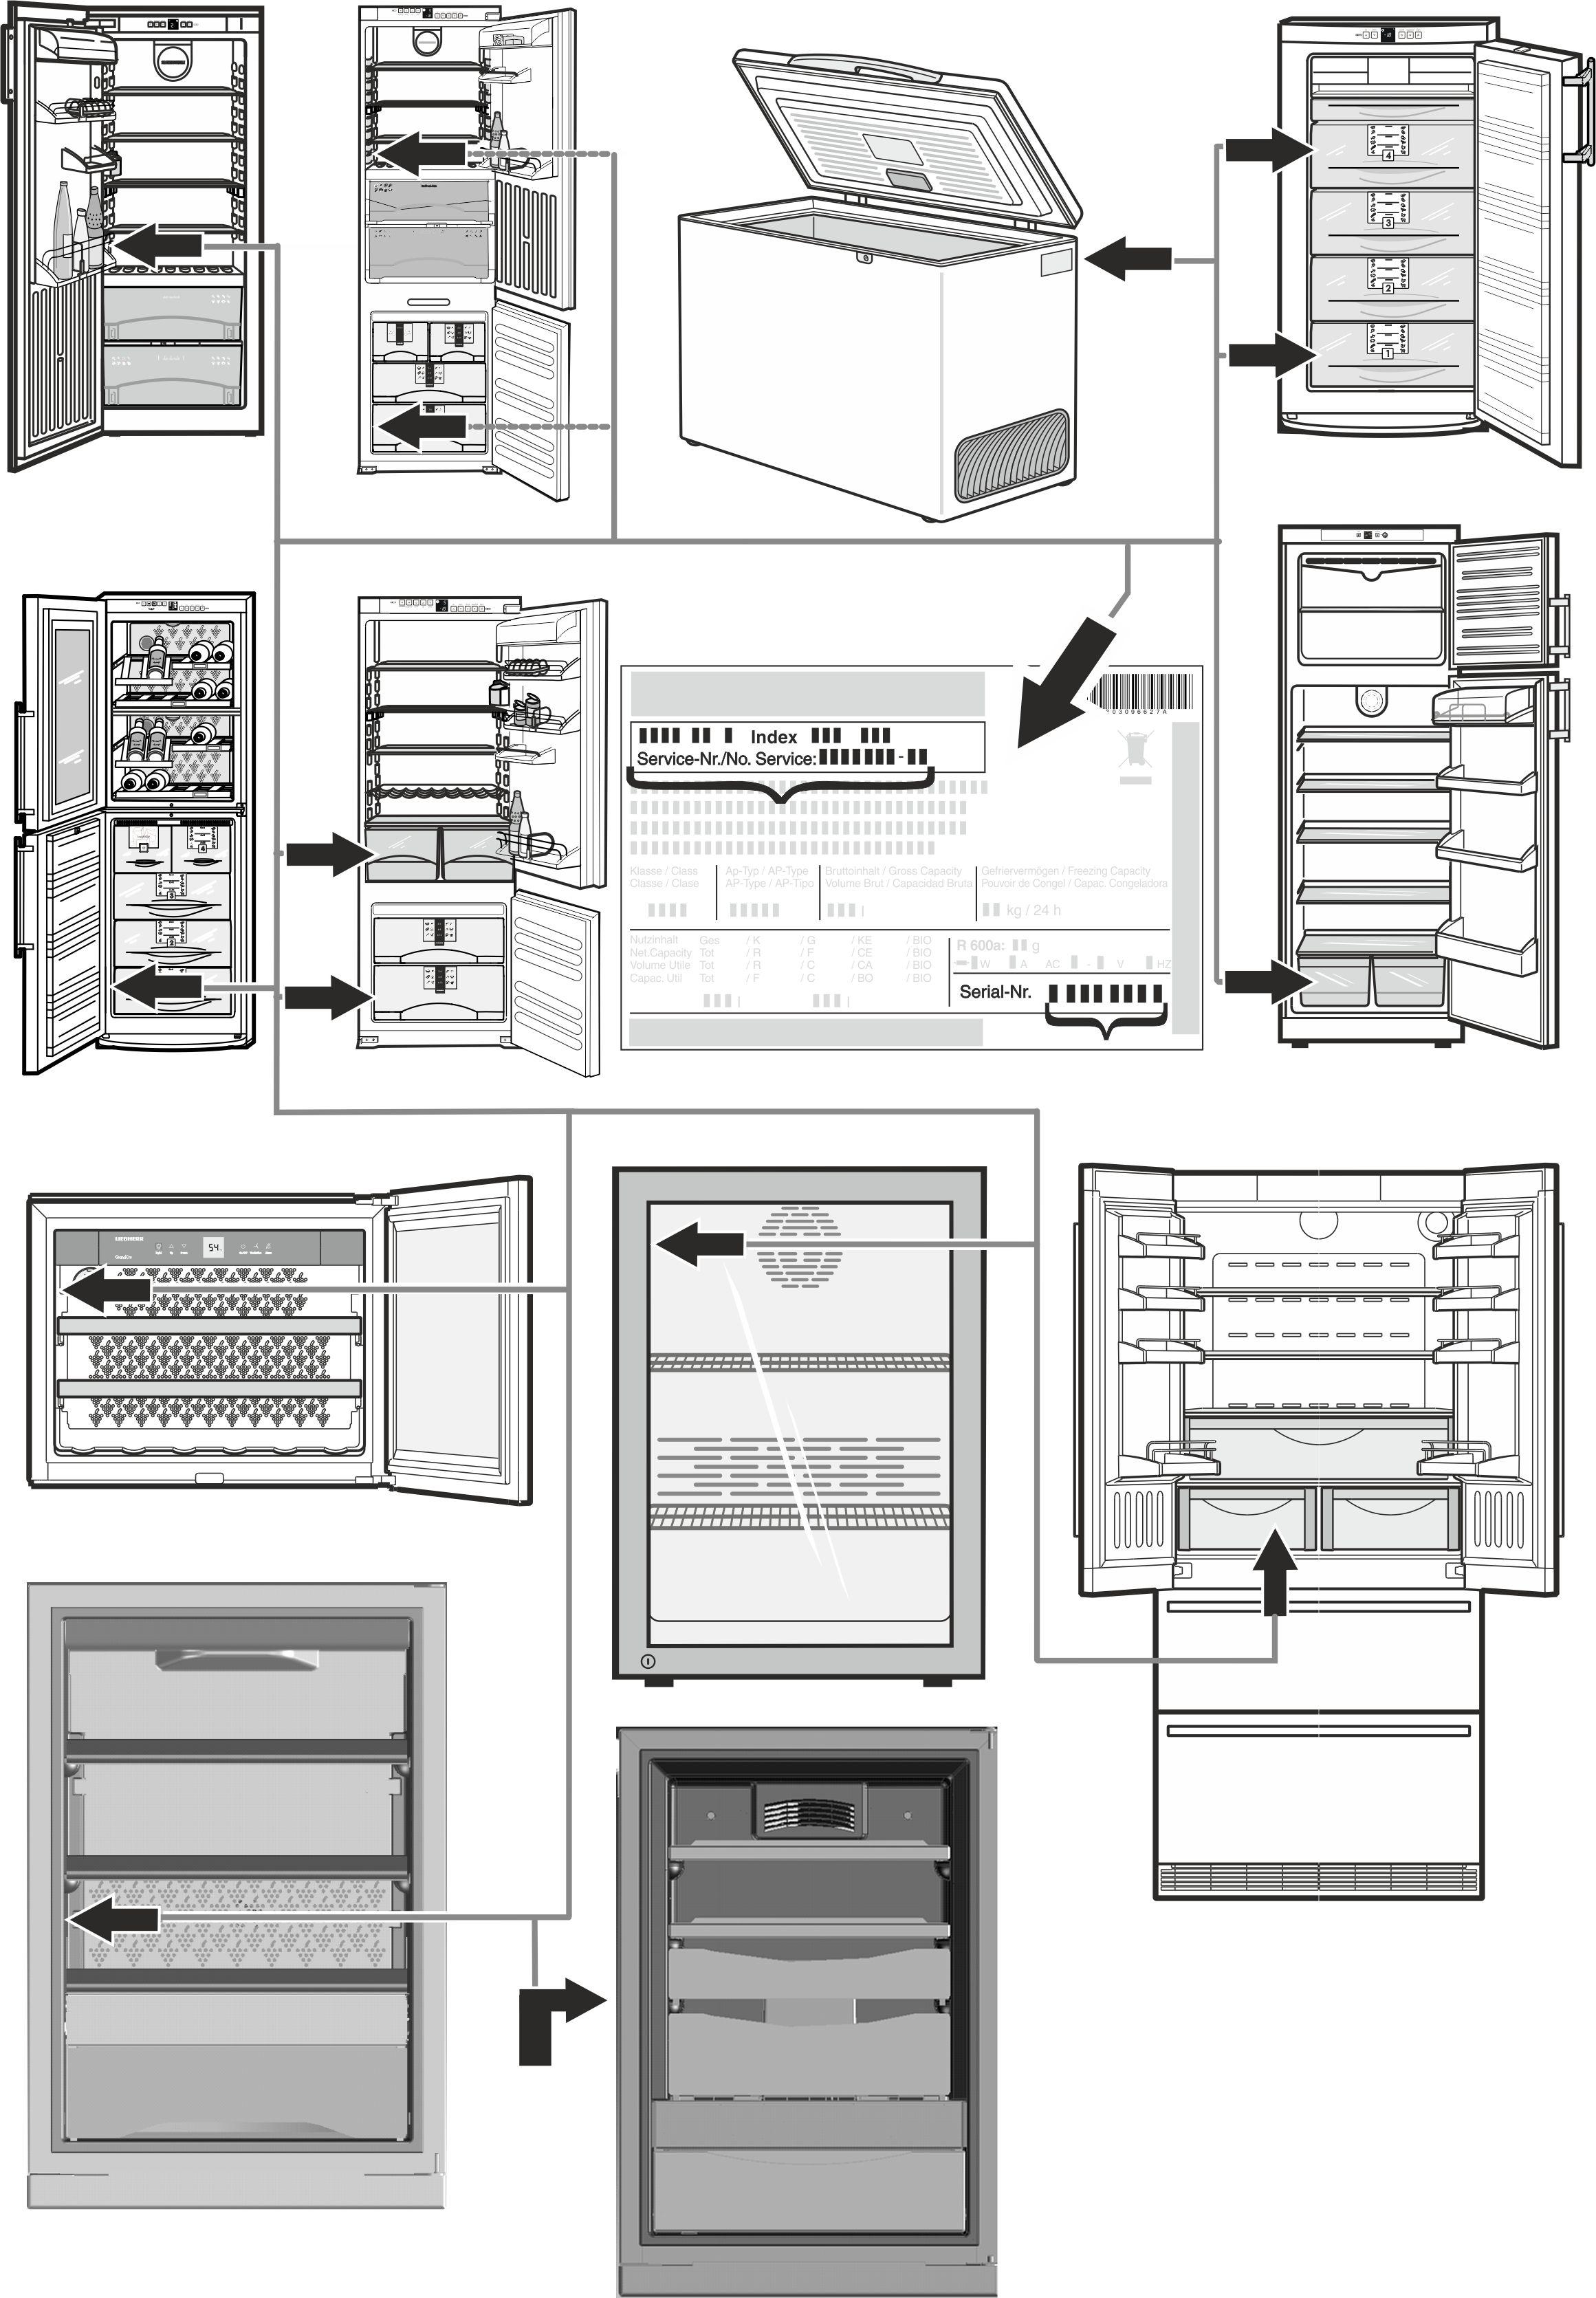 operating instructions rh liebherr us Liebherr Premium Manual No Frost Liebherr Refrigerator Freezer Aircraft